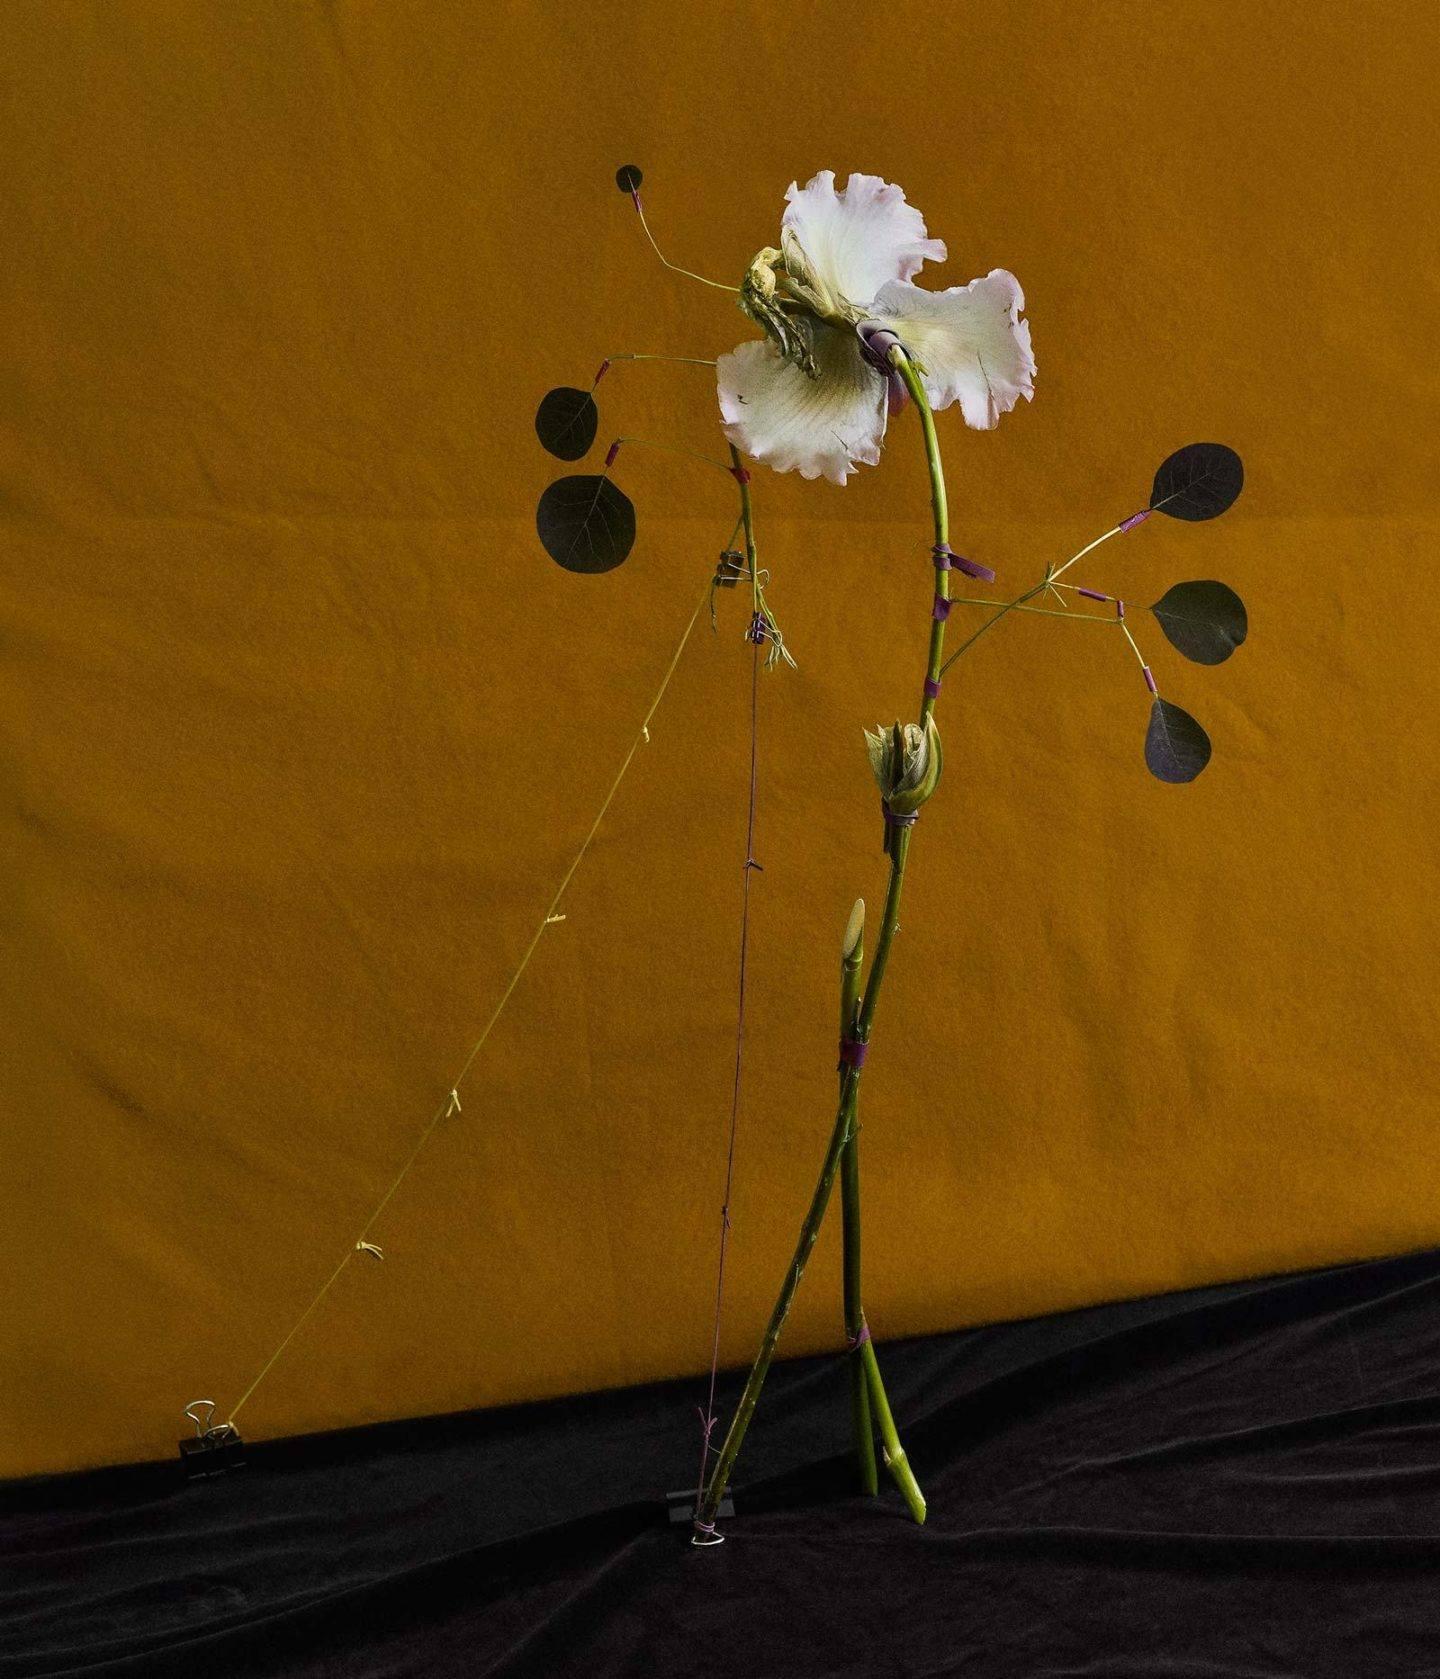 IGNANT-Art-Dominik-Tarabański-Roses-For-Mother-2